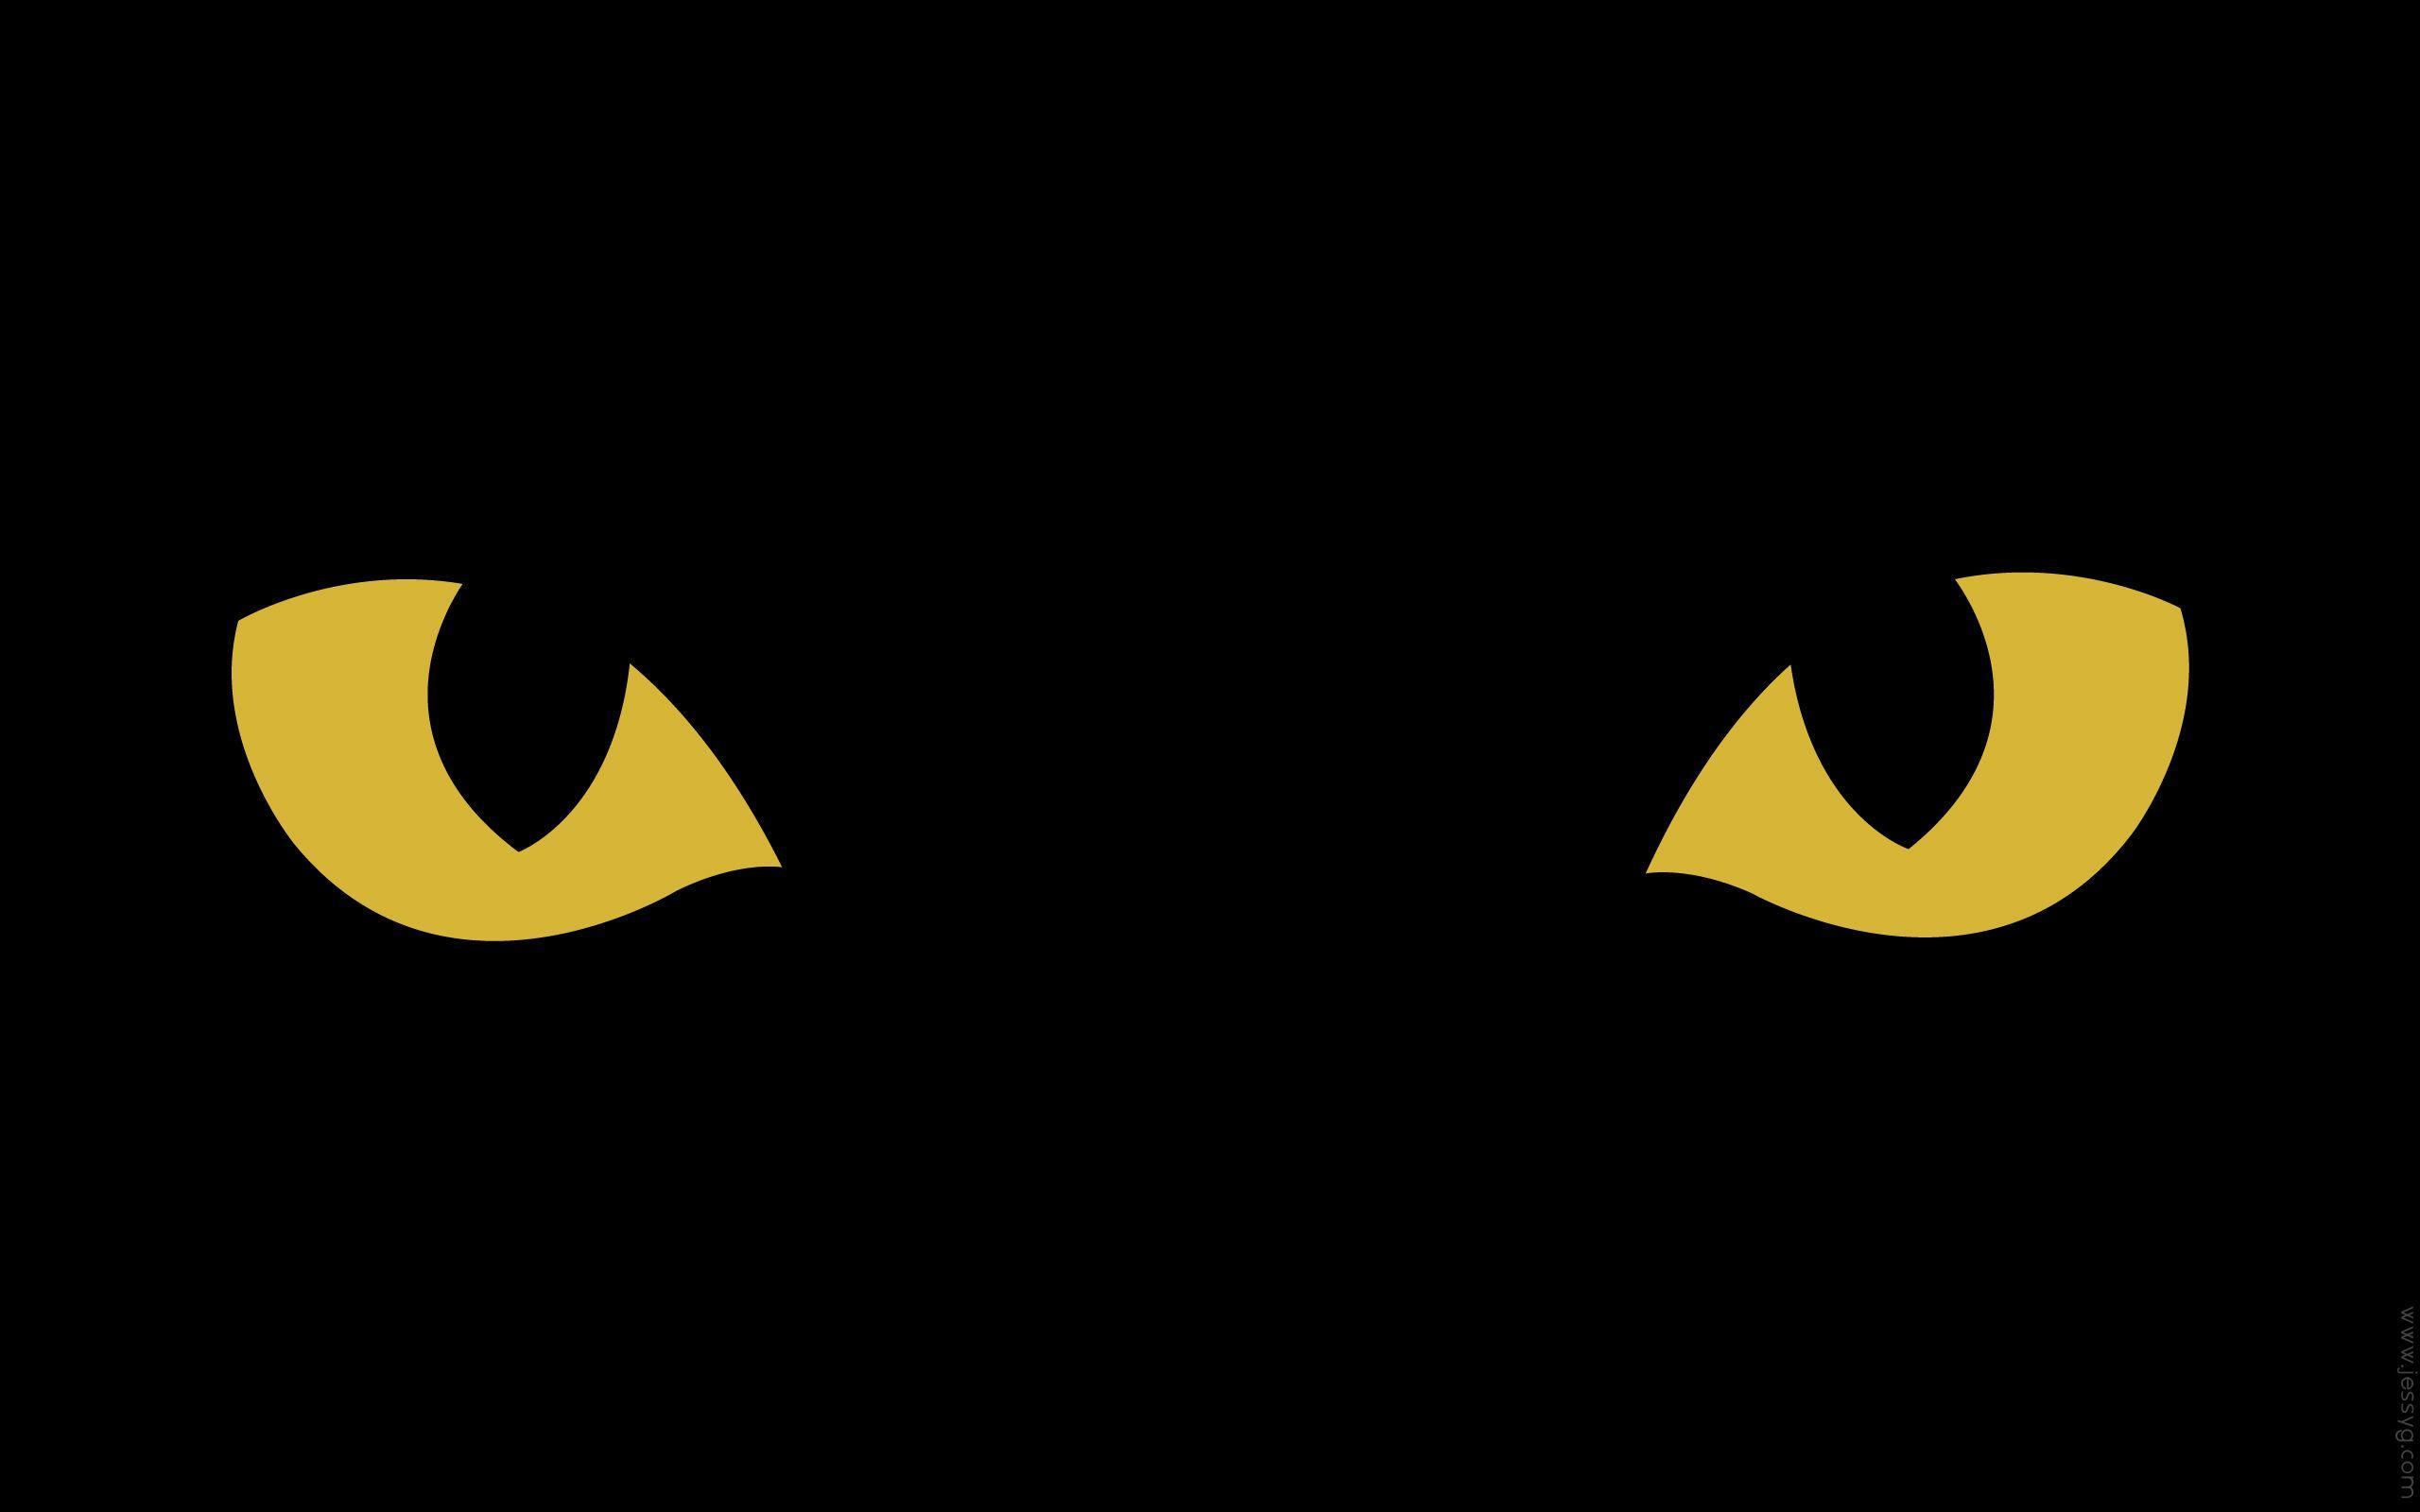 Black Cat Background Tumblr Black Cat Backgrounds ...